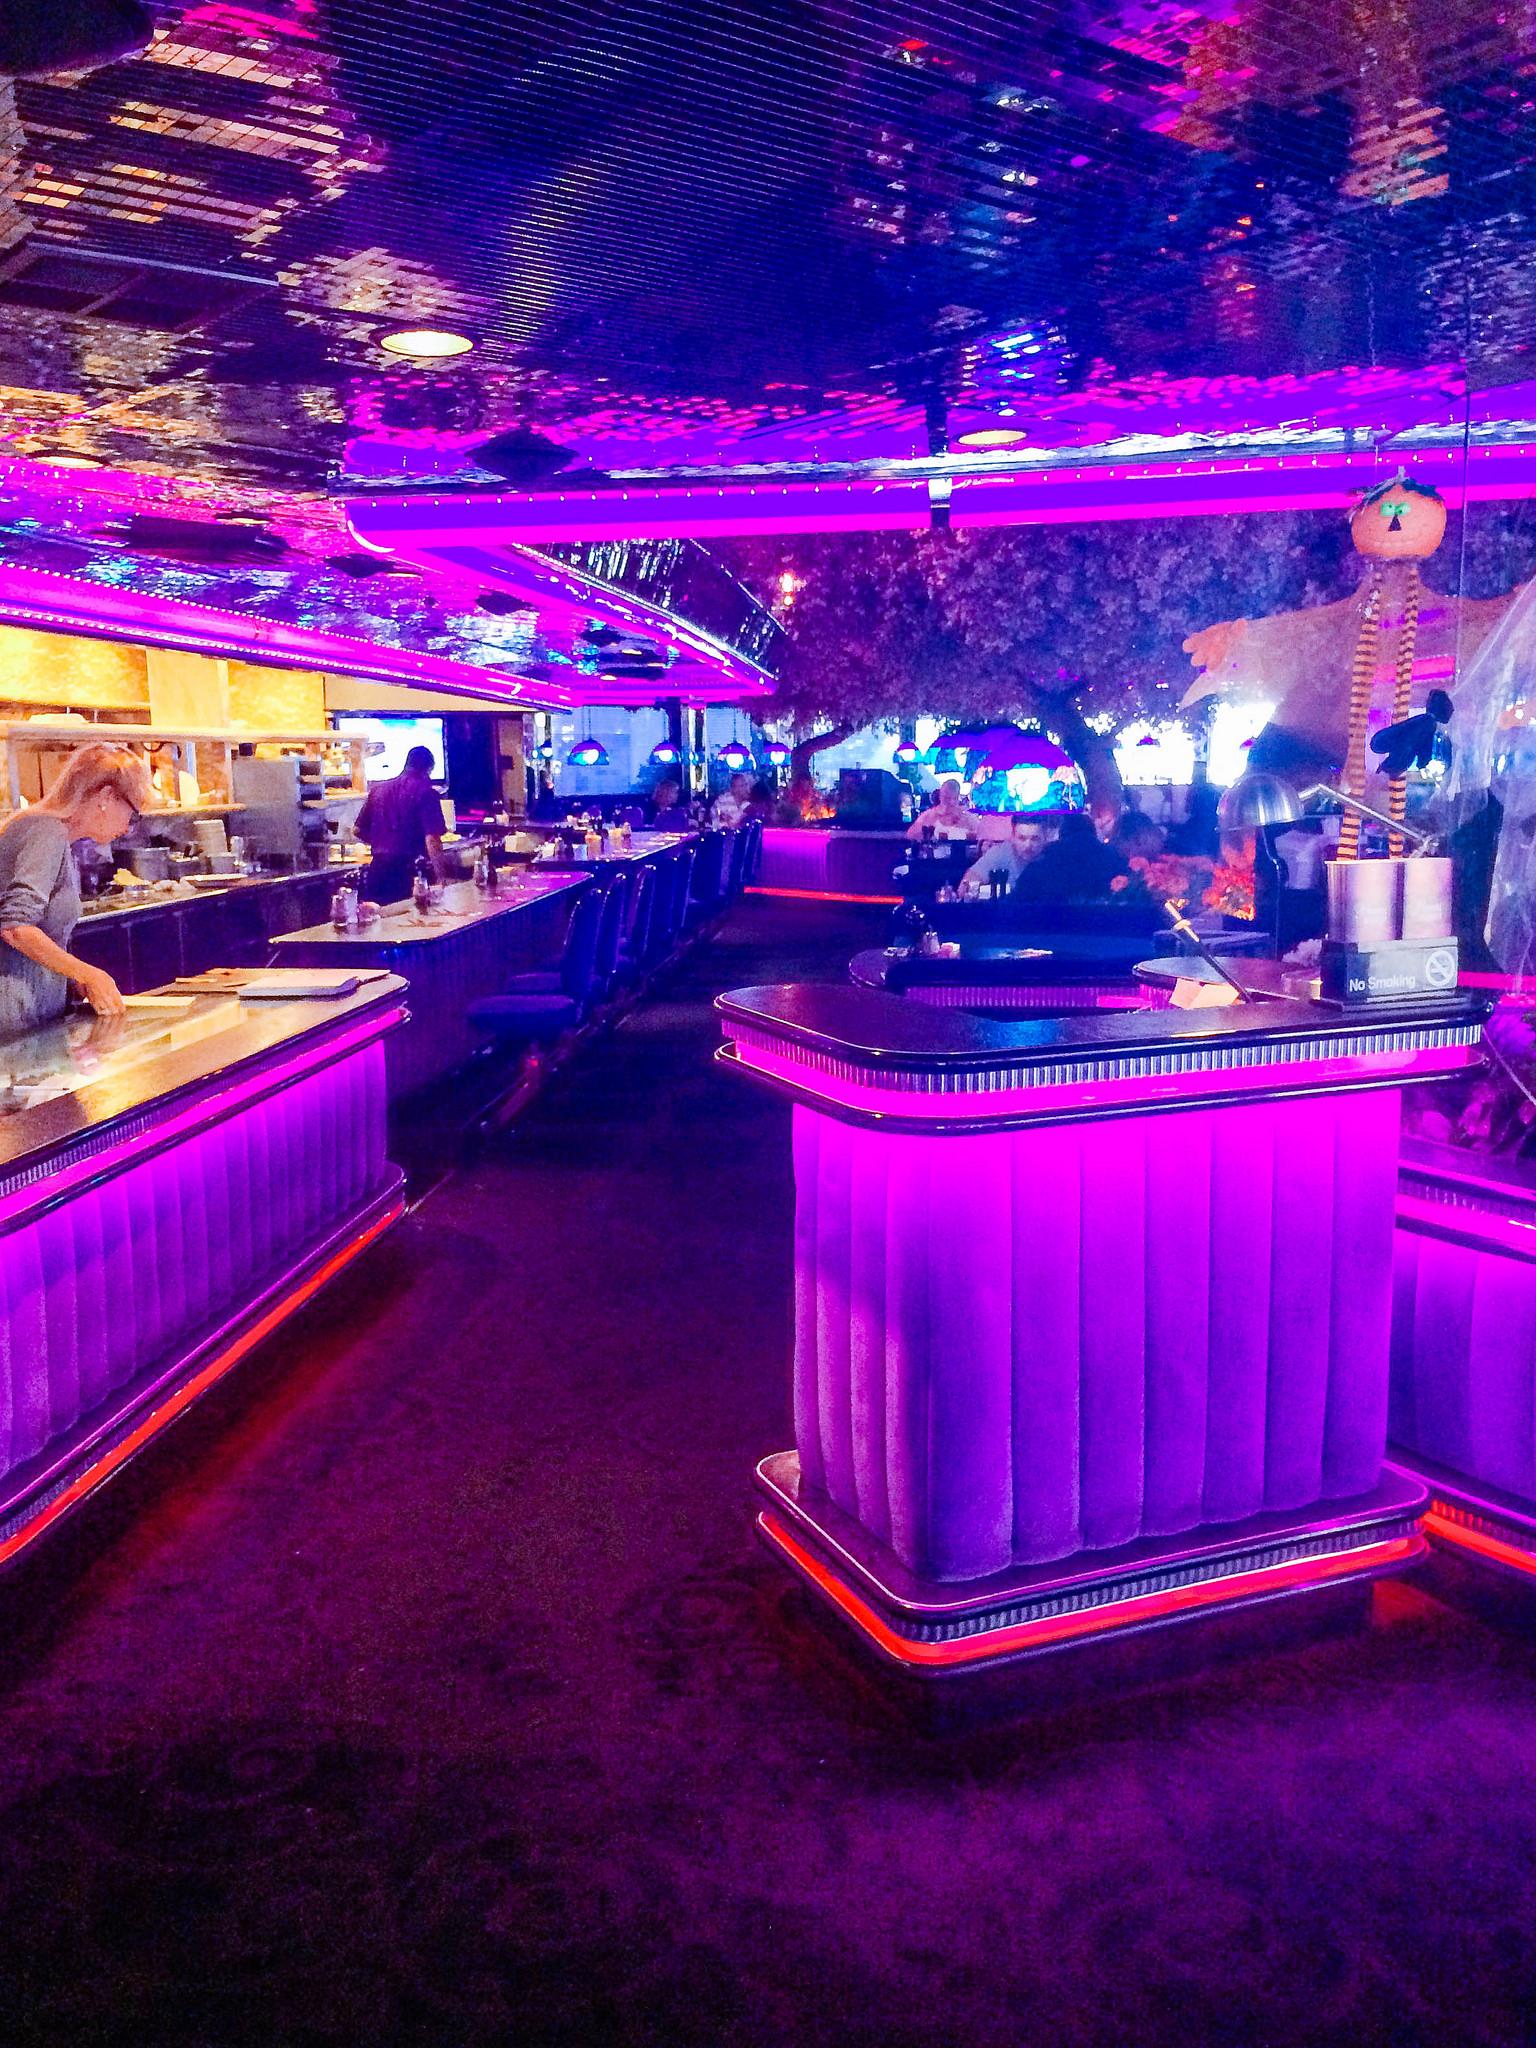 24 Hours on Fremont Street, Las Vegas